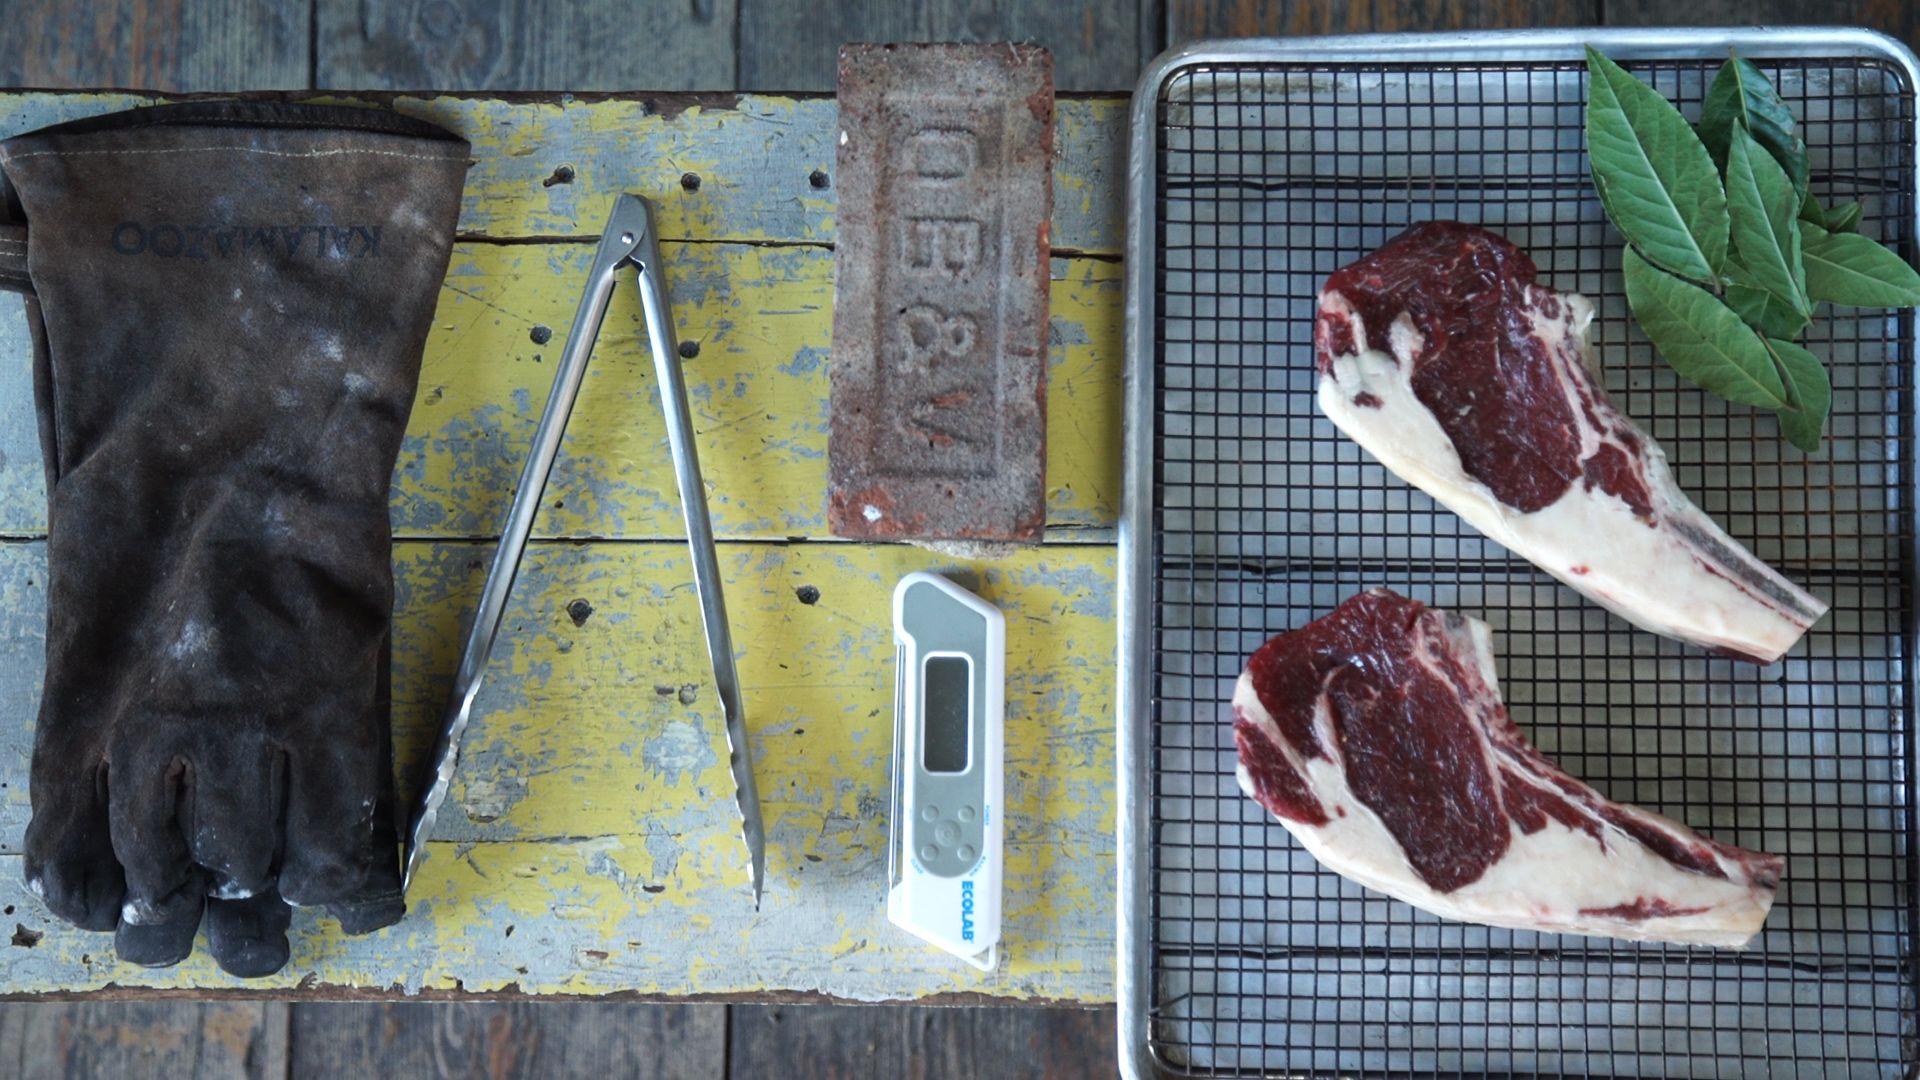 The Most Badass Way to Cook Steak